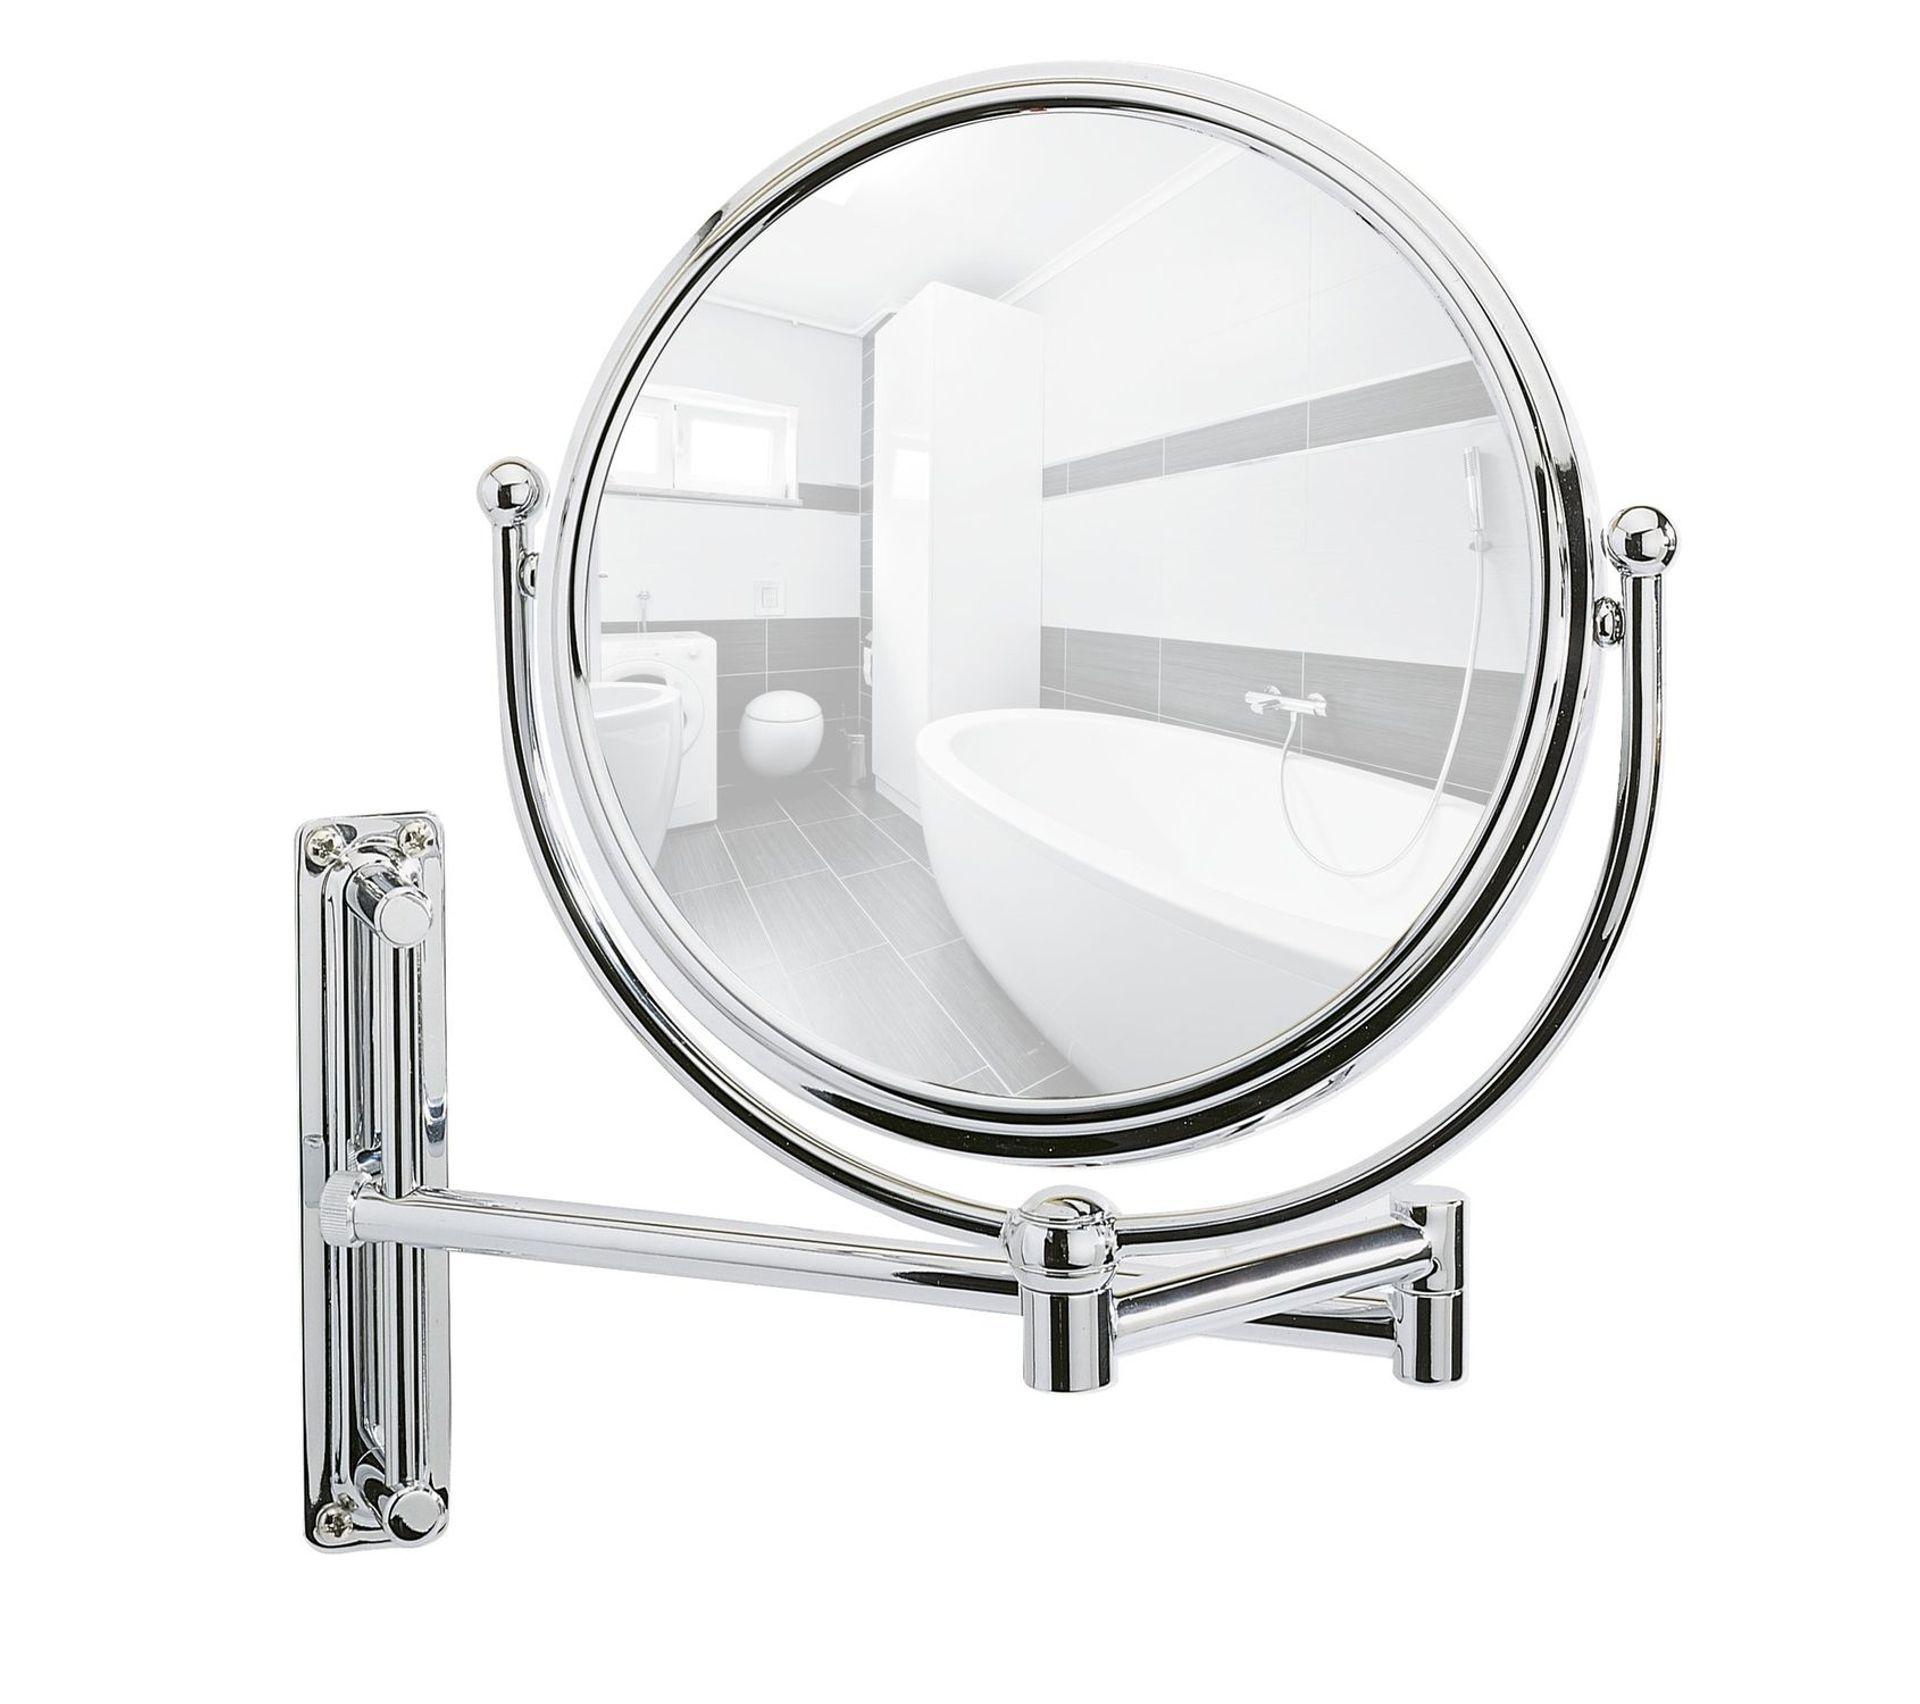 Miroir Mural Grossissant De Salle De Bain Deluxe - Diam. 16 Cm - Argent